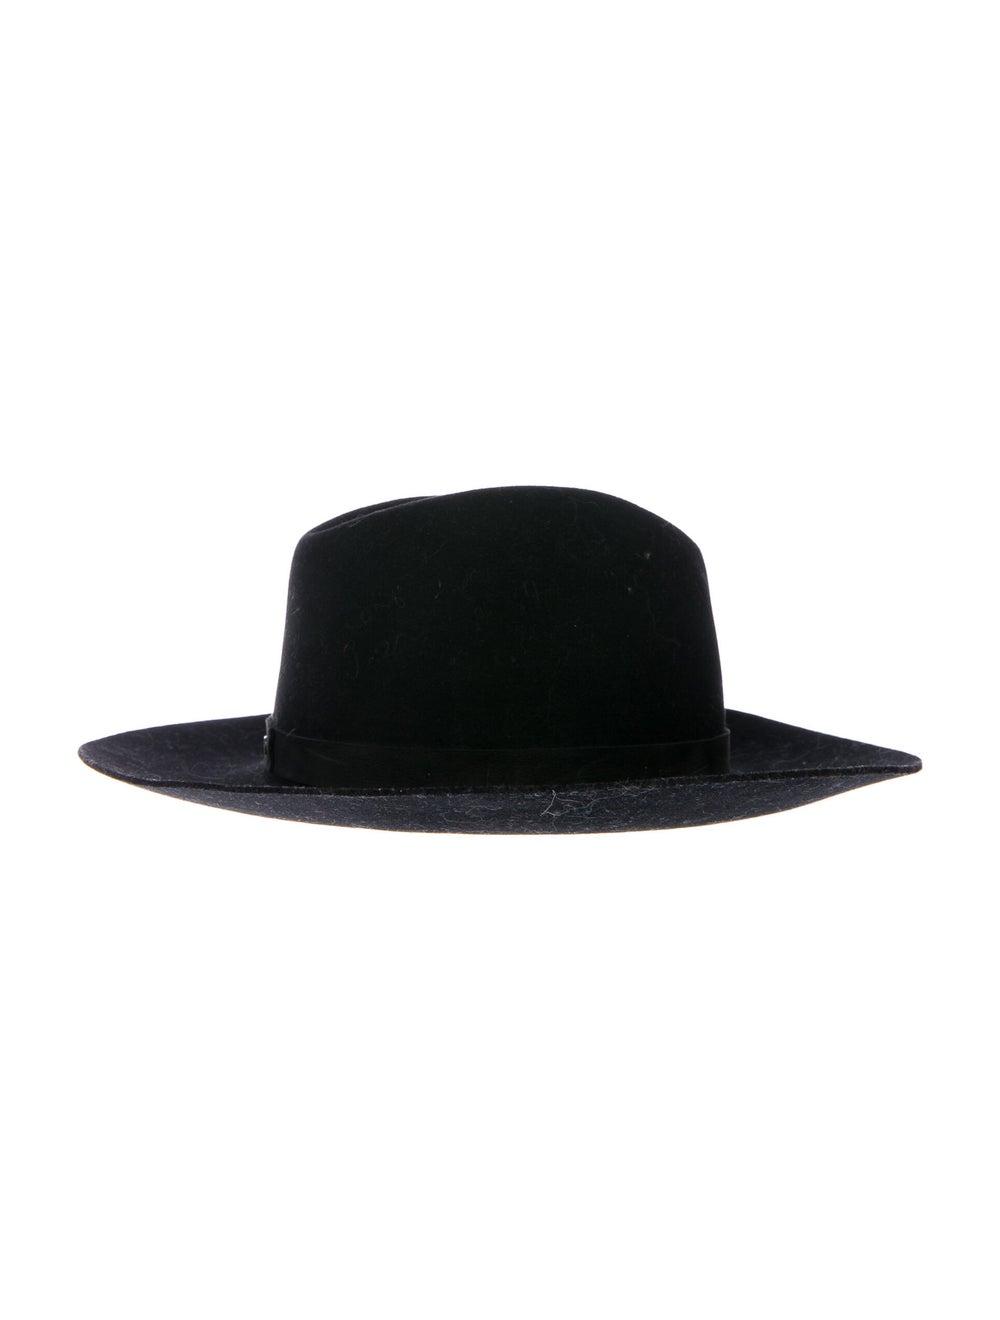 Janessa Leone Wool Felt Hat Black - image 2